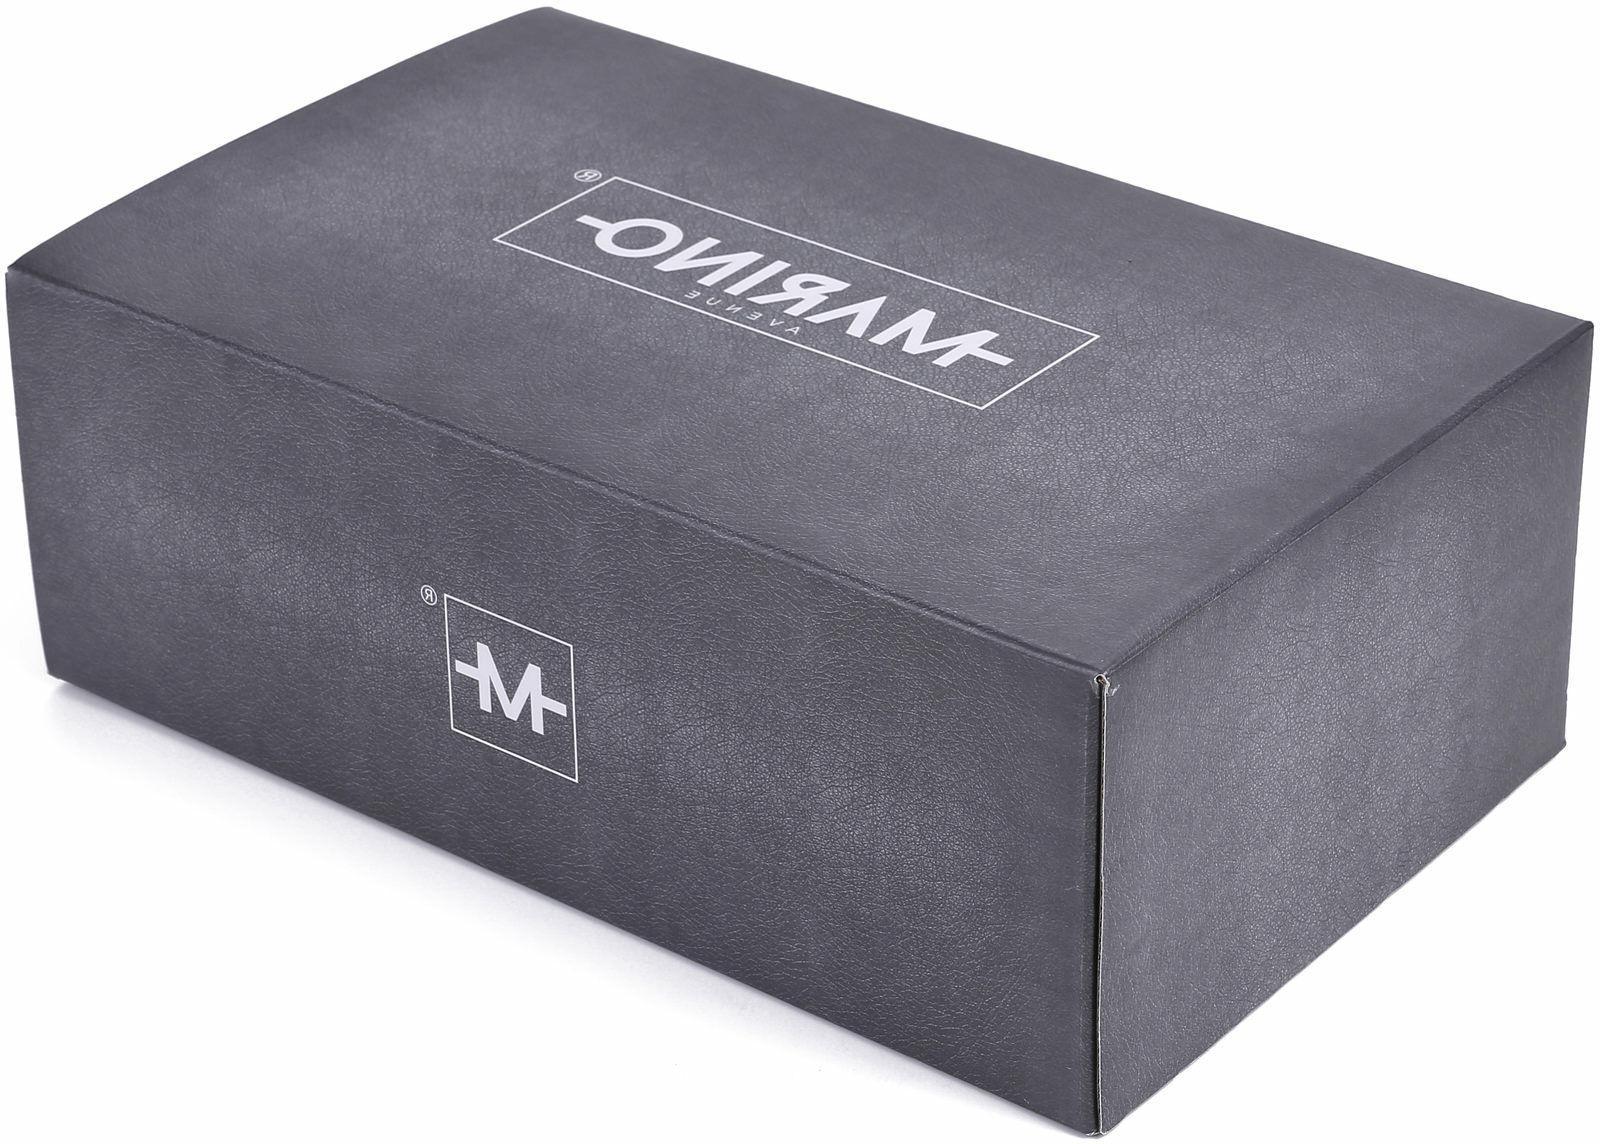 Marino Suede Oxford Dress Shoes Men - Business Tuxedo Shoes